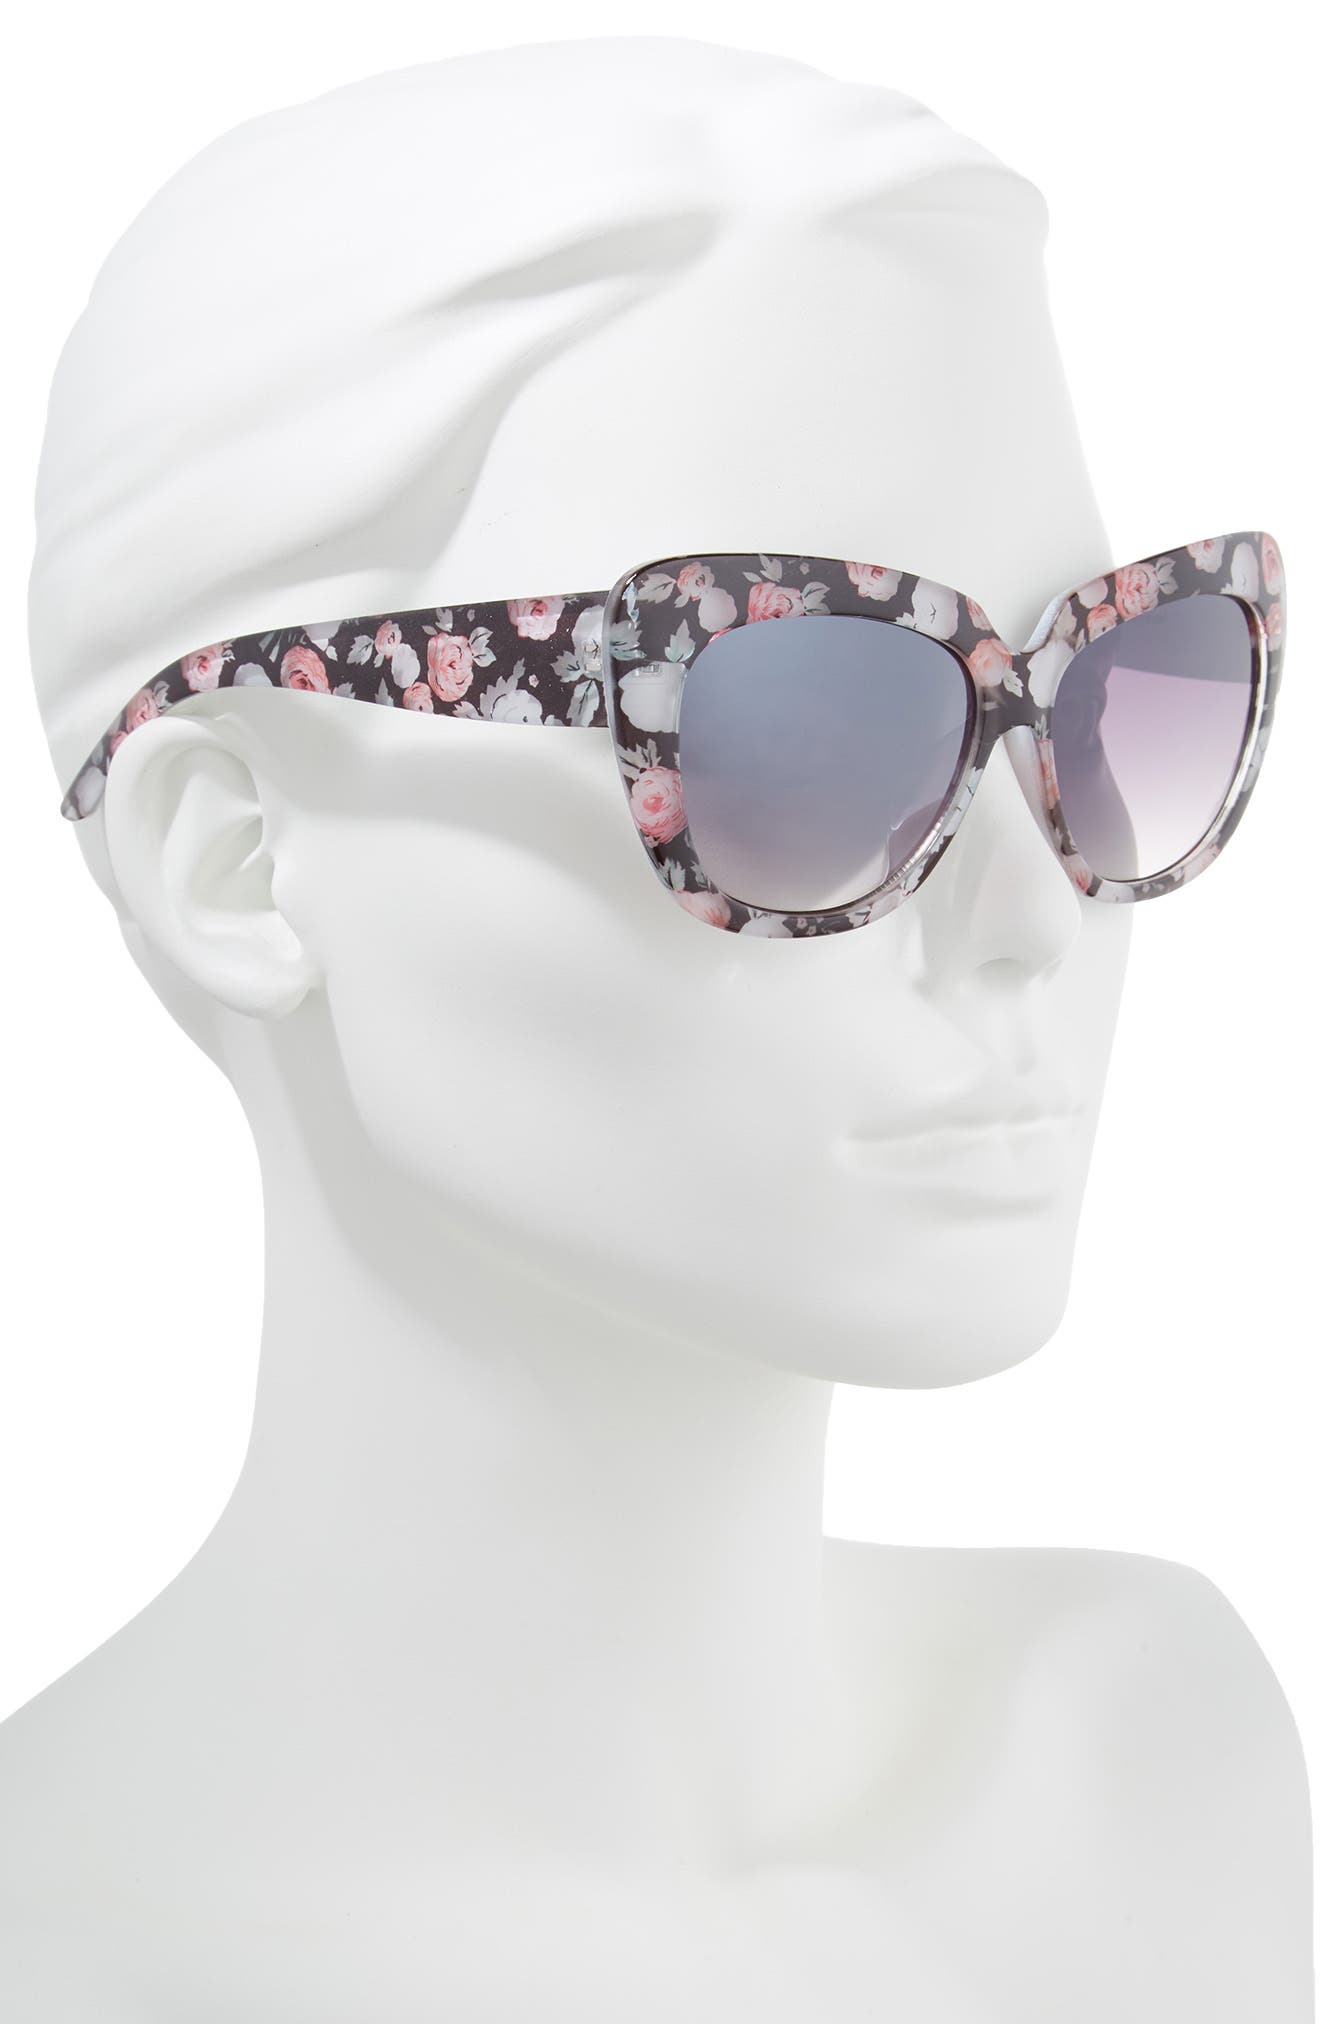 57mm Print Cat Eye Sunglasses,                             Alternate thumbnail 2, color,                             Black/ Multi